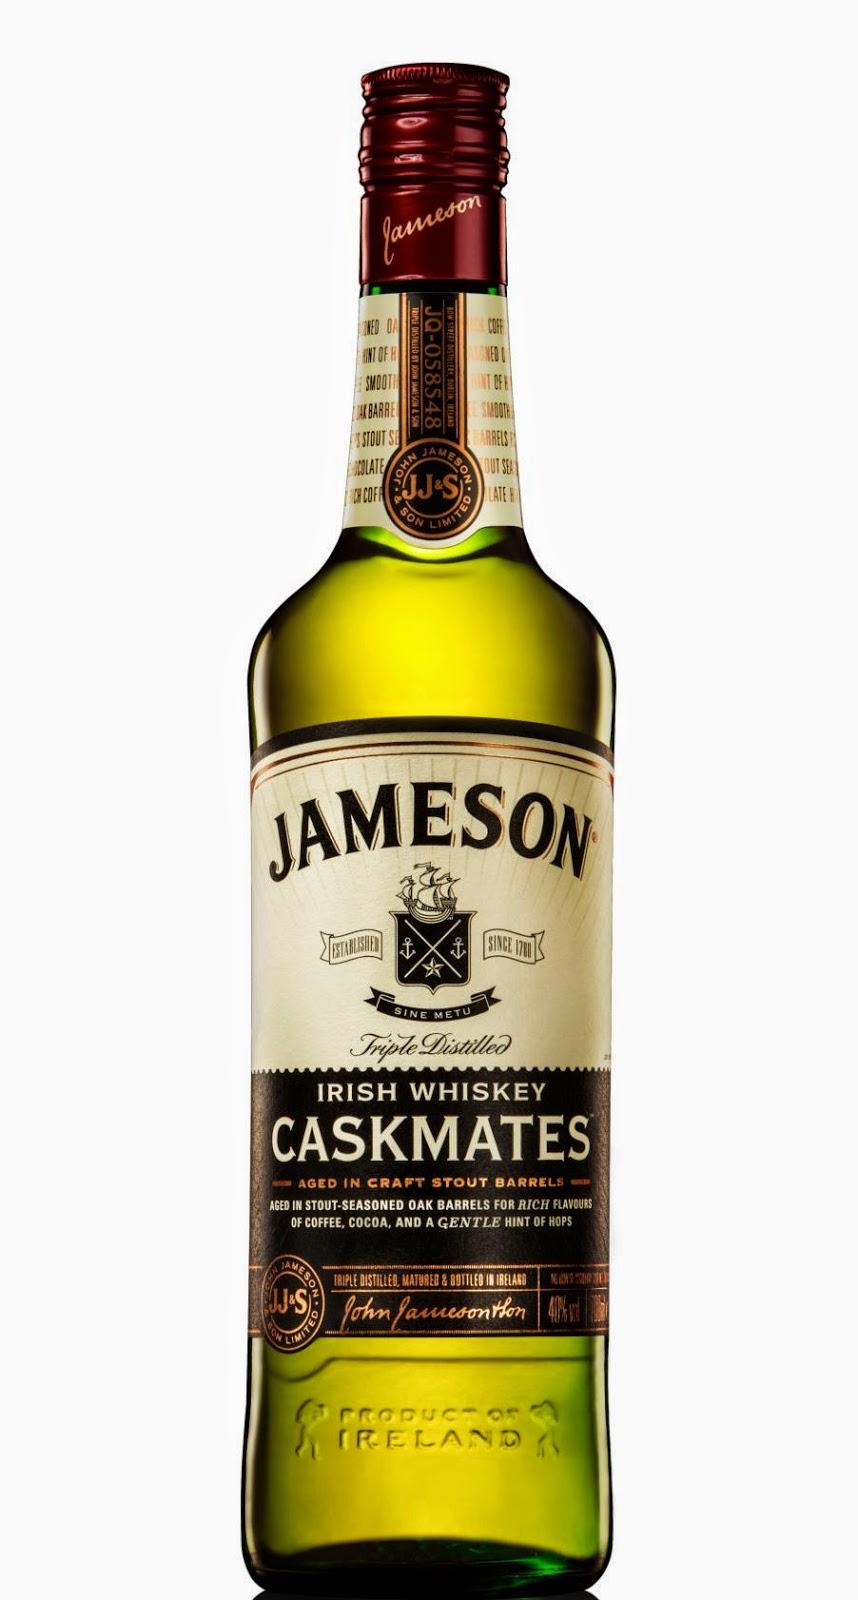 Jameson Caskmates Stout Edition Irish Whiskey